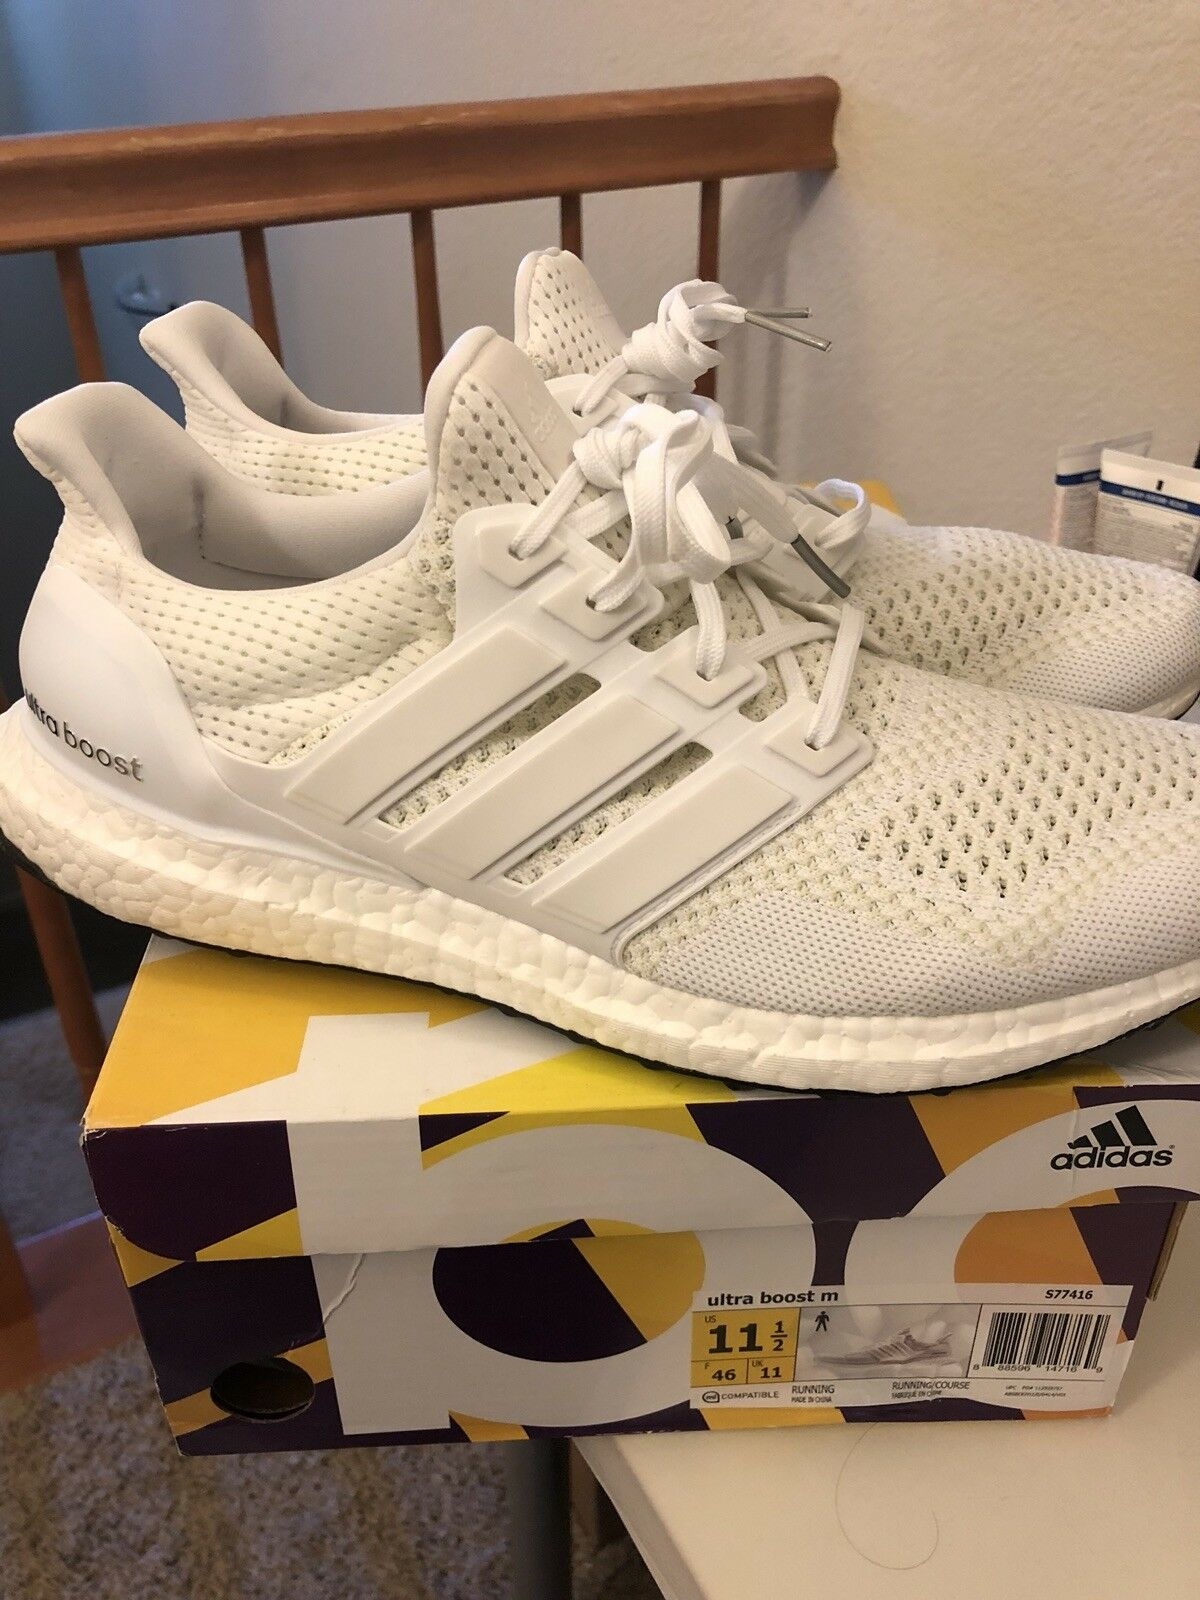 Adidas s77513 - 1,0 - weiße s77513 Adidas größe 11,5 ankurbeln 8d1db9